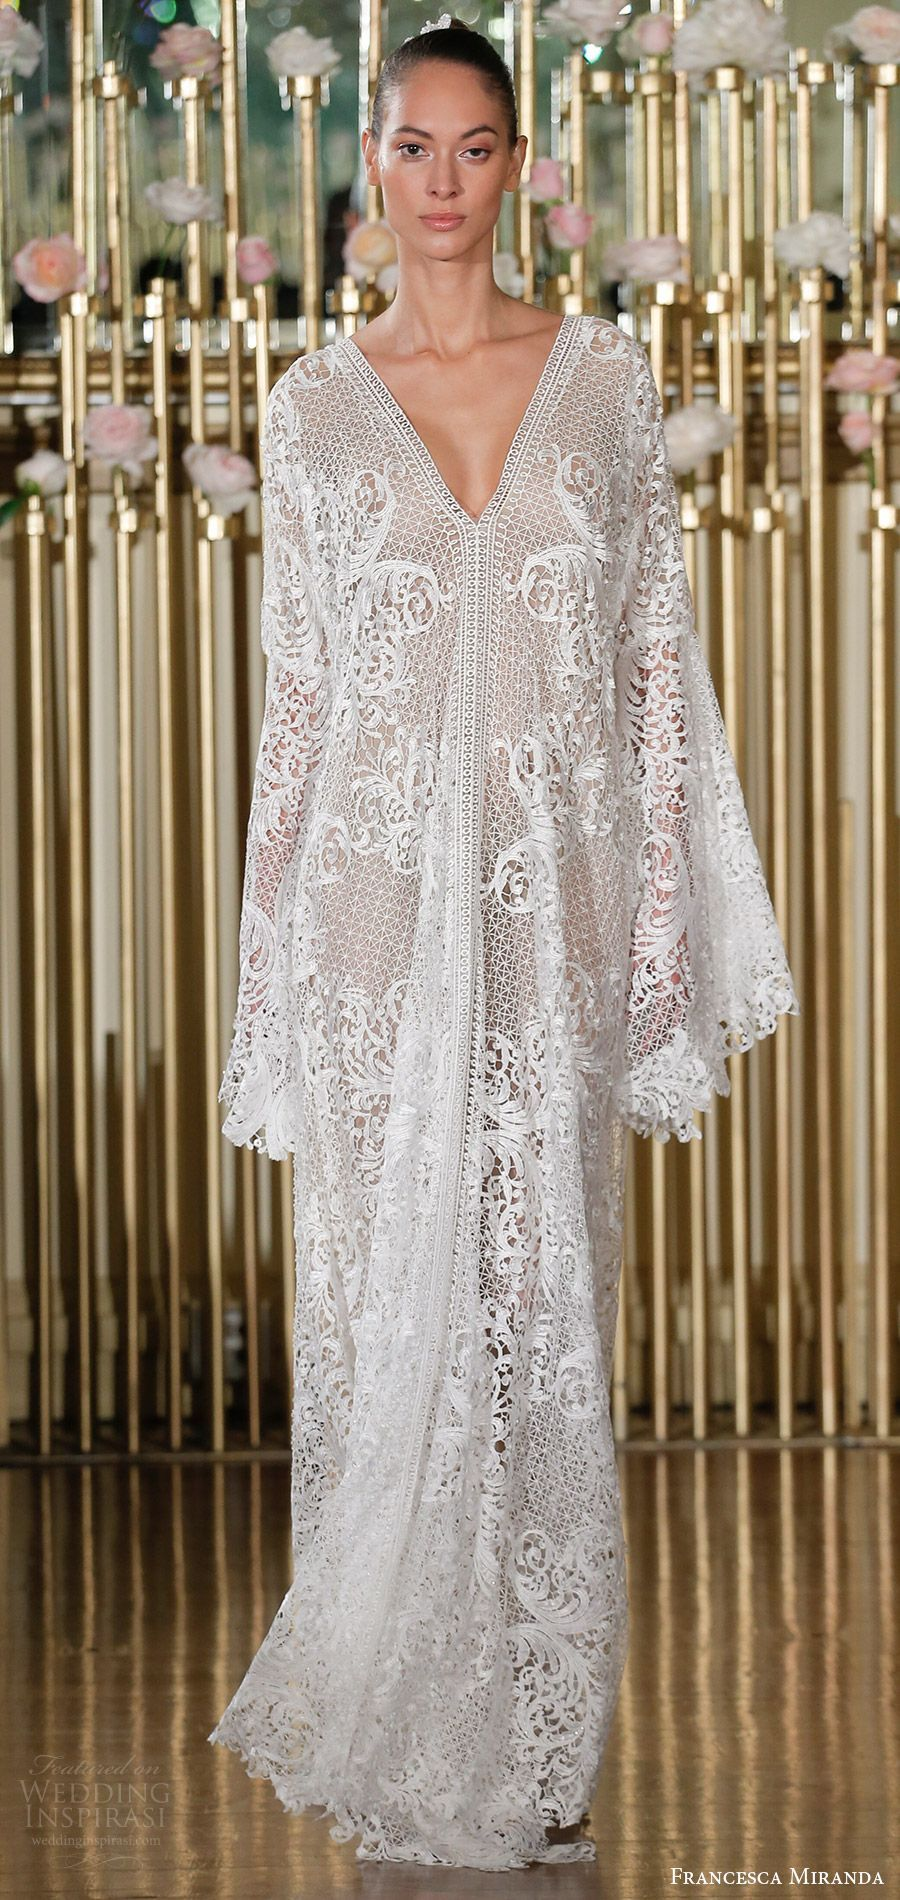 Francesca miranda spring bridal long sleeves beaded lace v neck